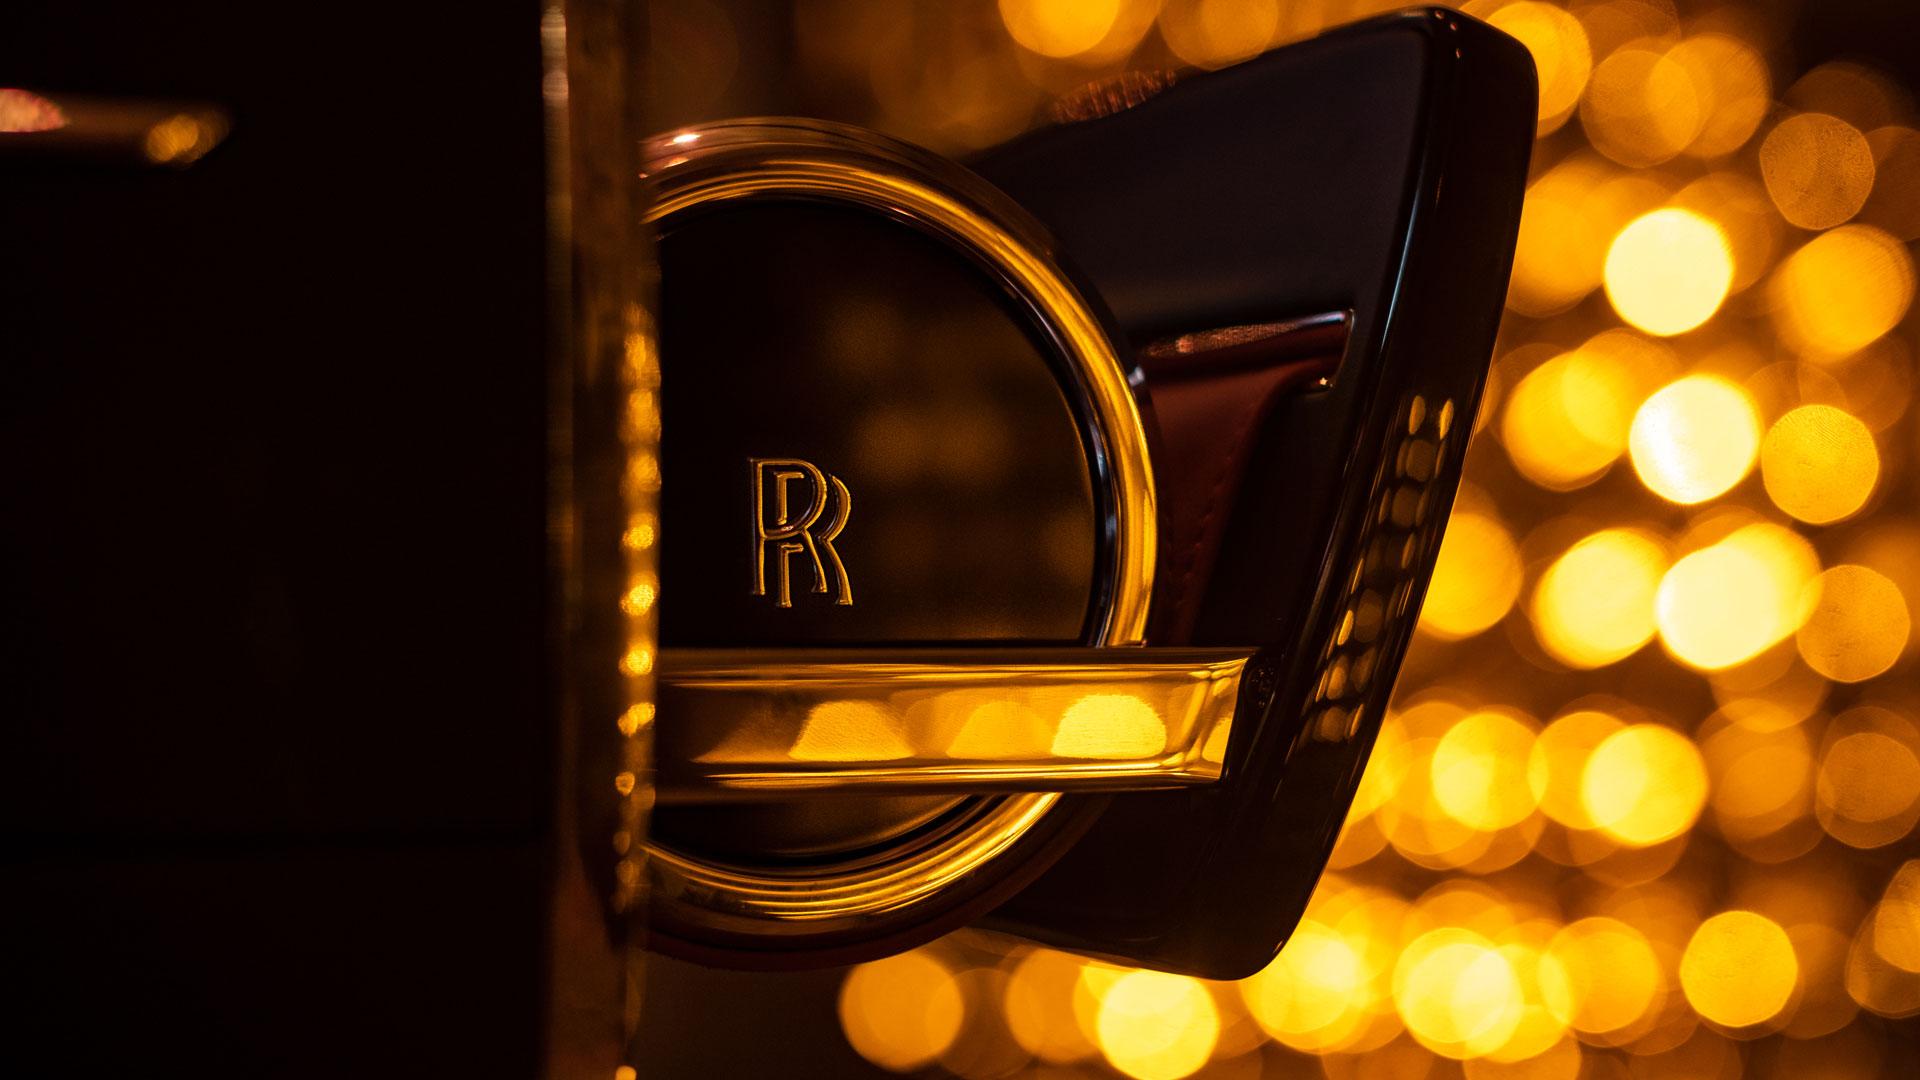 Rolls Royce bespoke: designing for a luxury brand